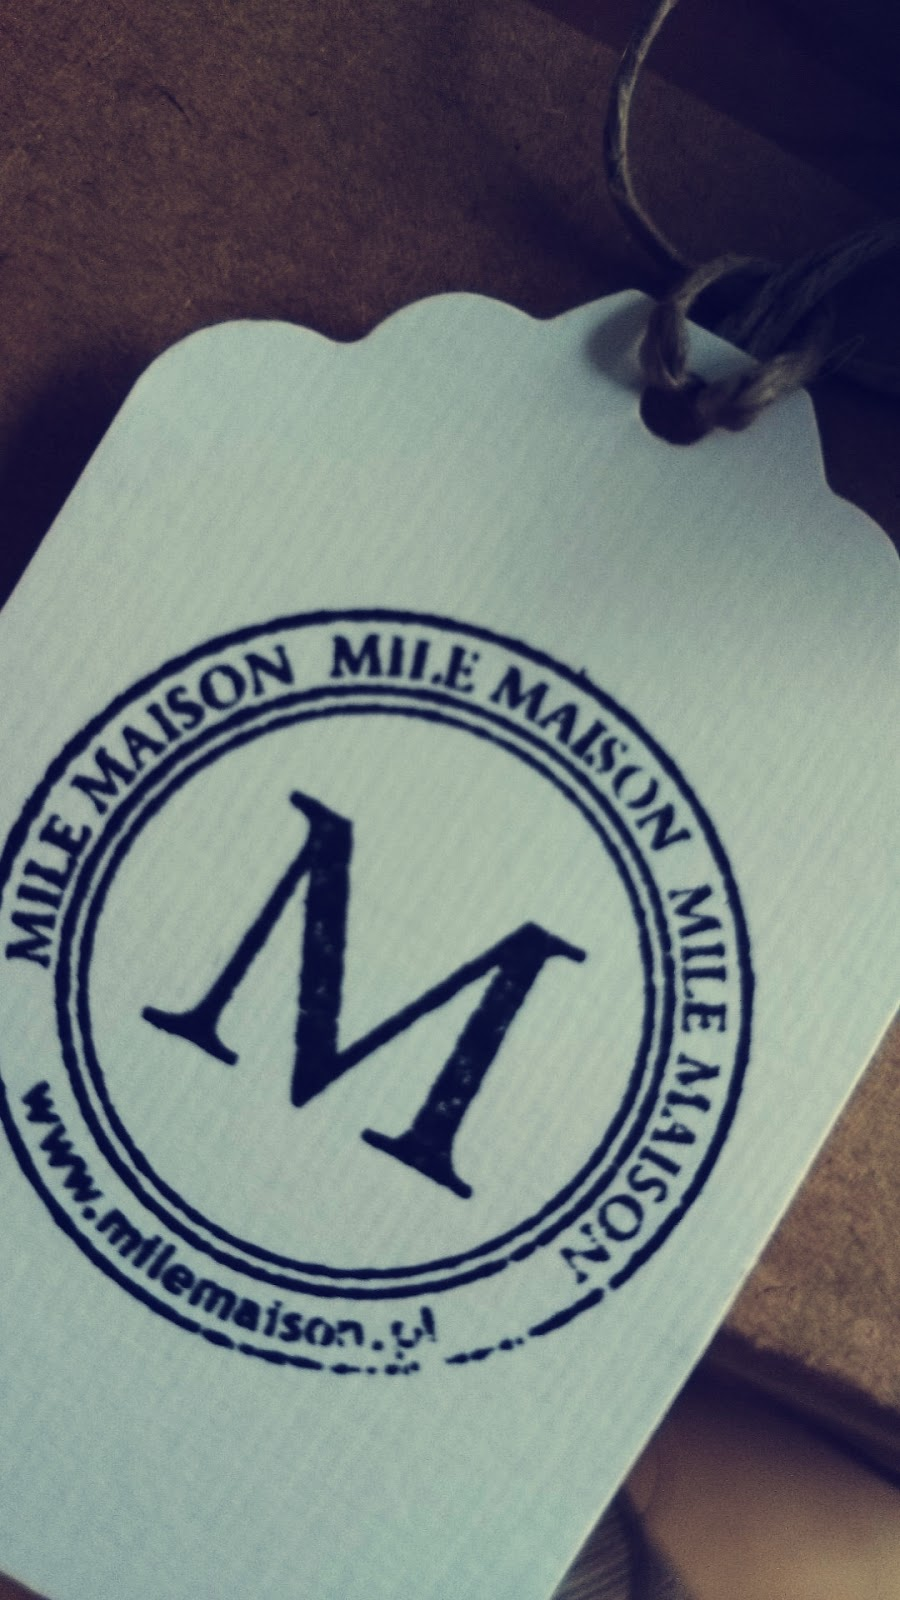 Etykietka sklepu Mile Maison